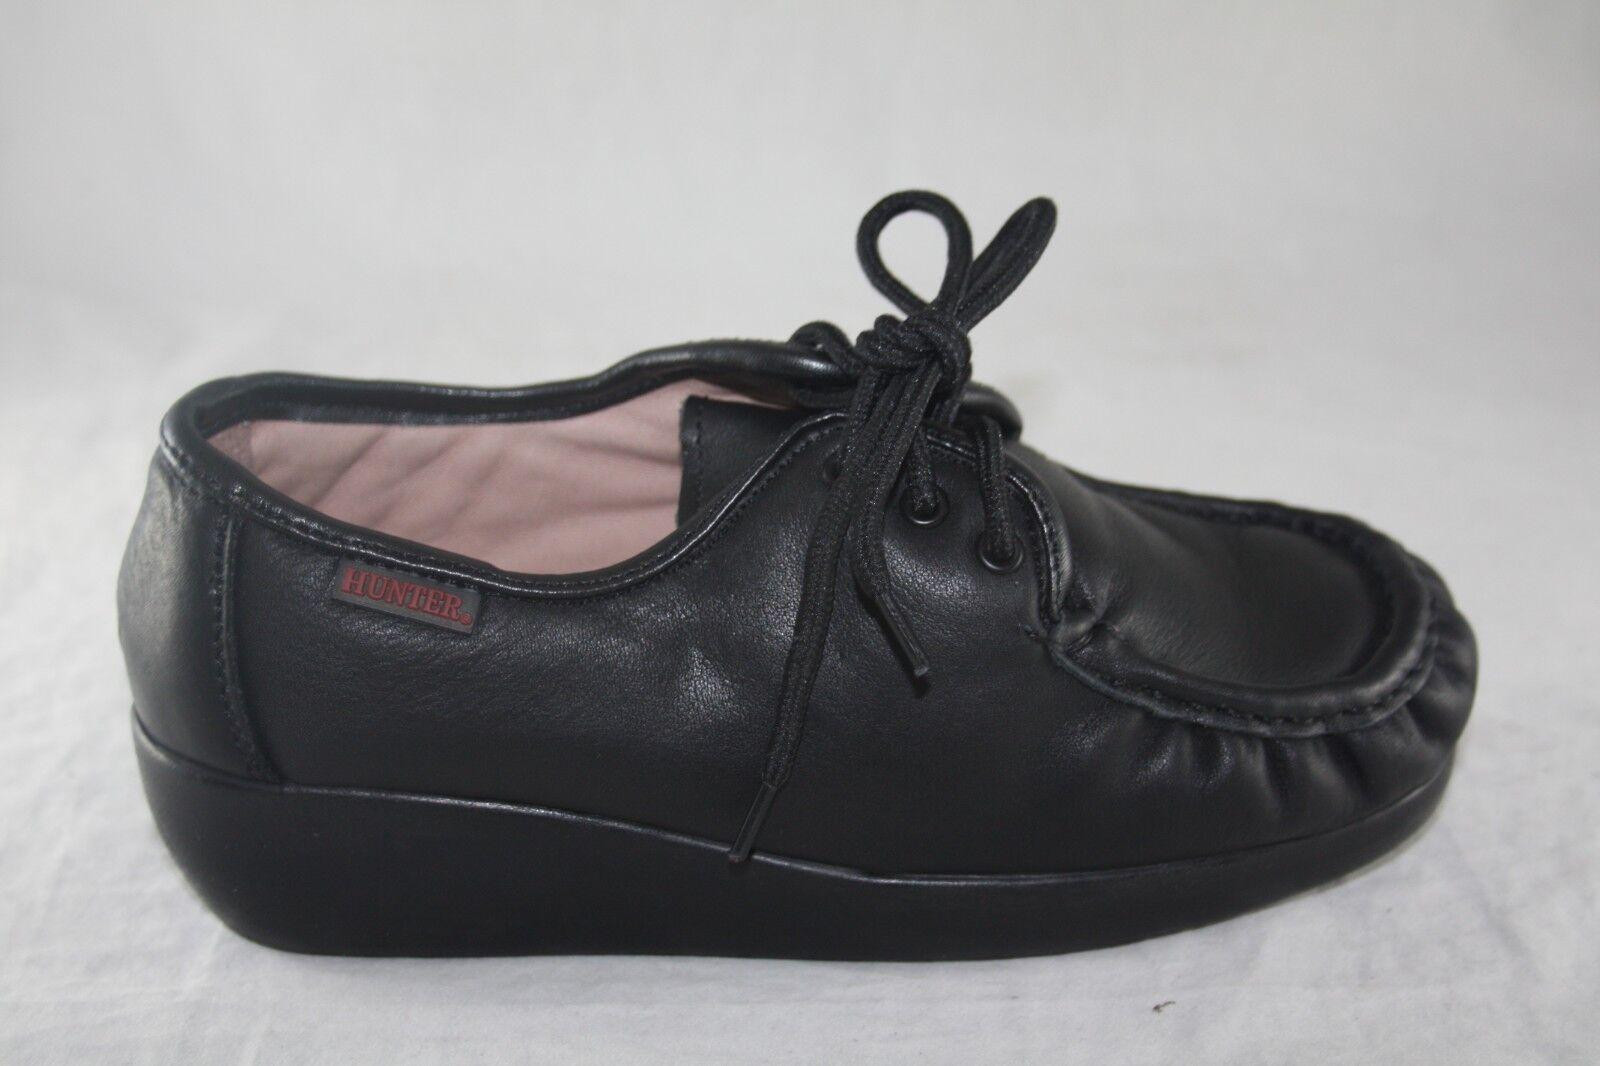 femmes GRAND HUNTER 3005 noir GENUINE LEATHER WORK chaussures SLIP RESISTANT